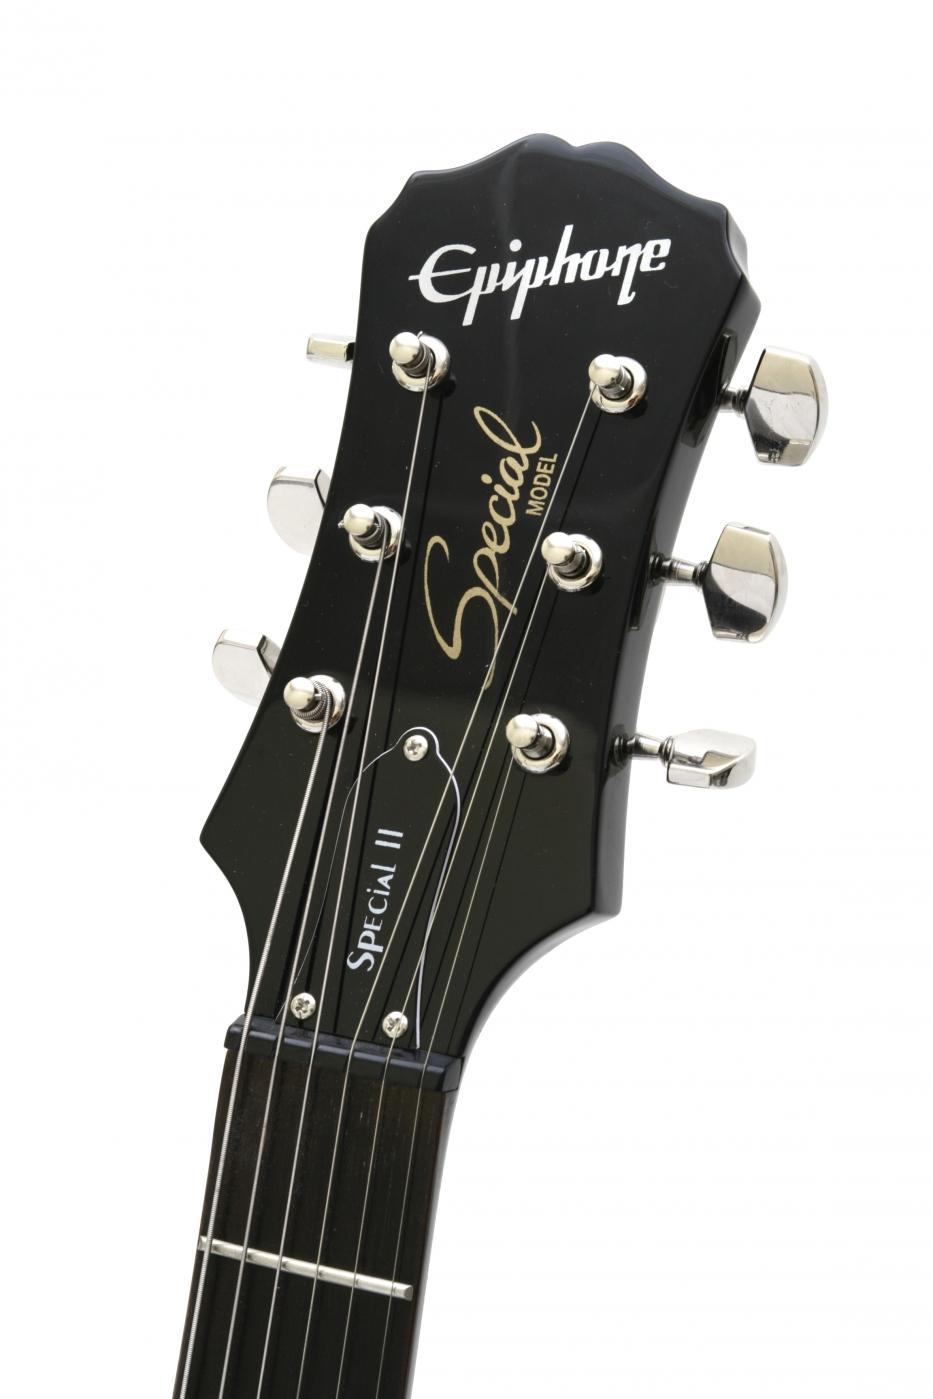 Epiphone lp special ii les paul electric guitar ebony